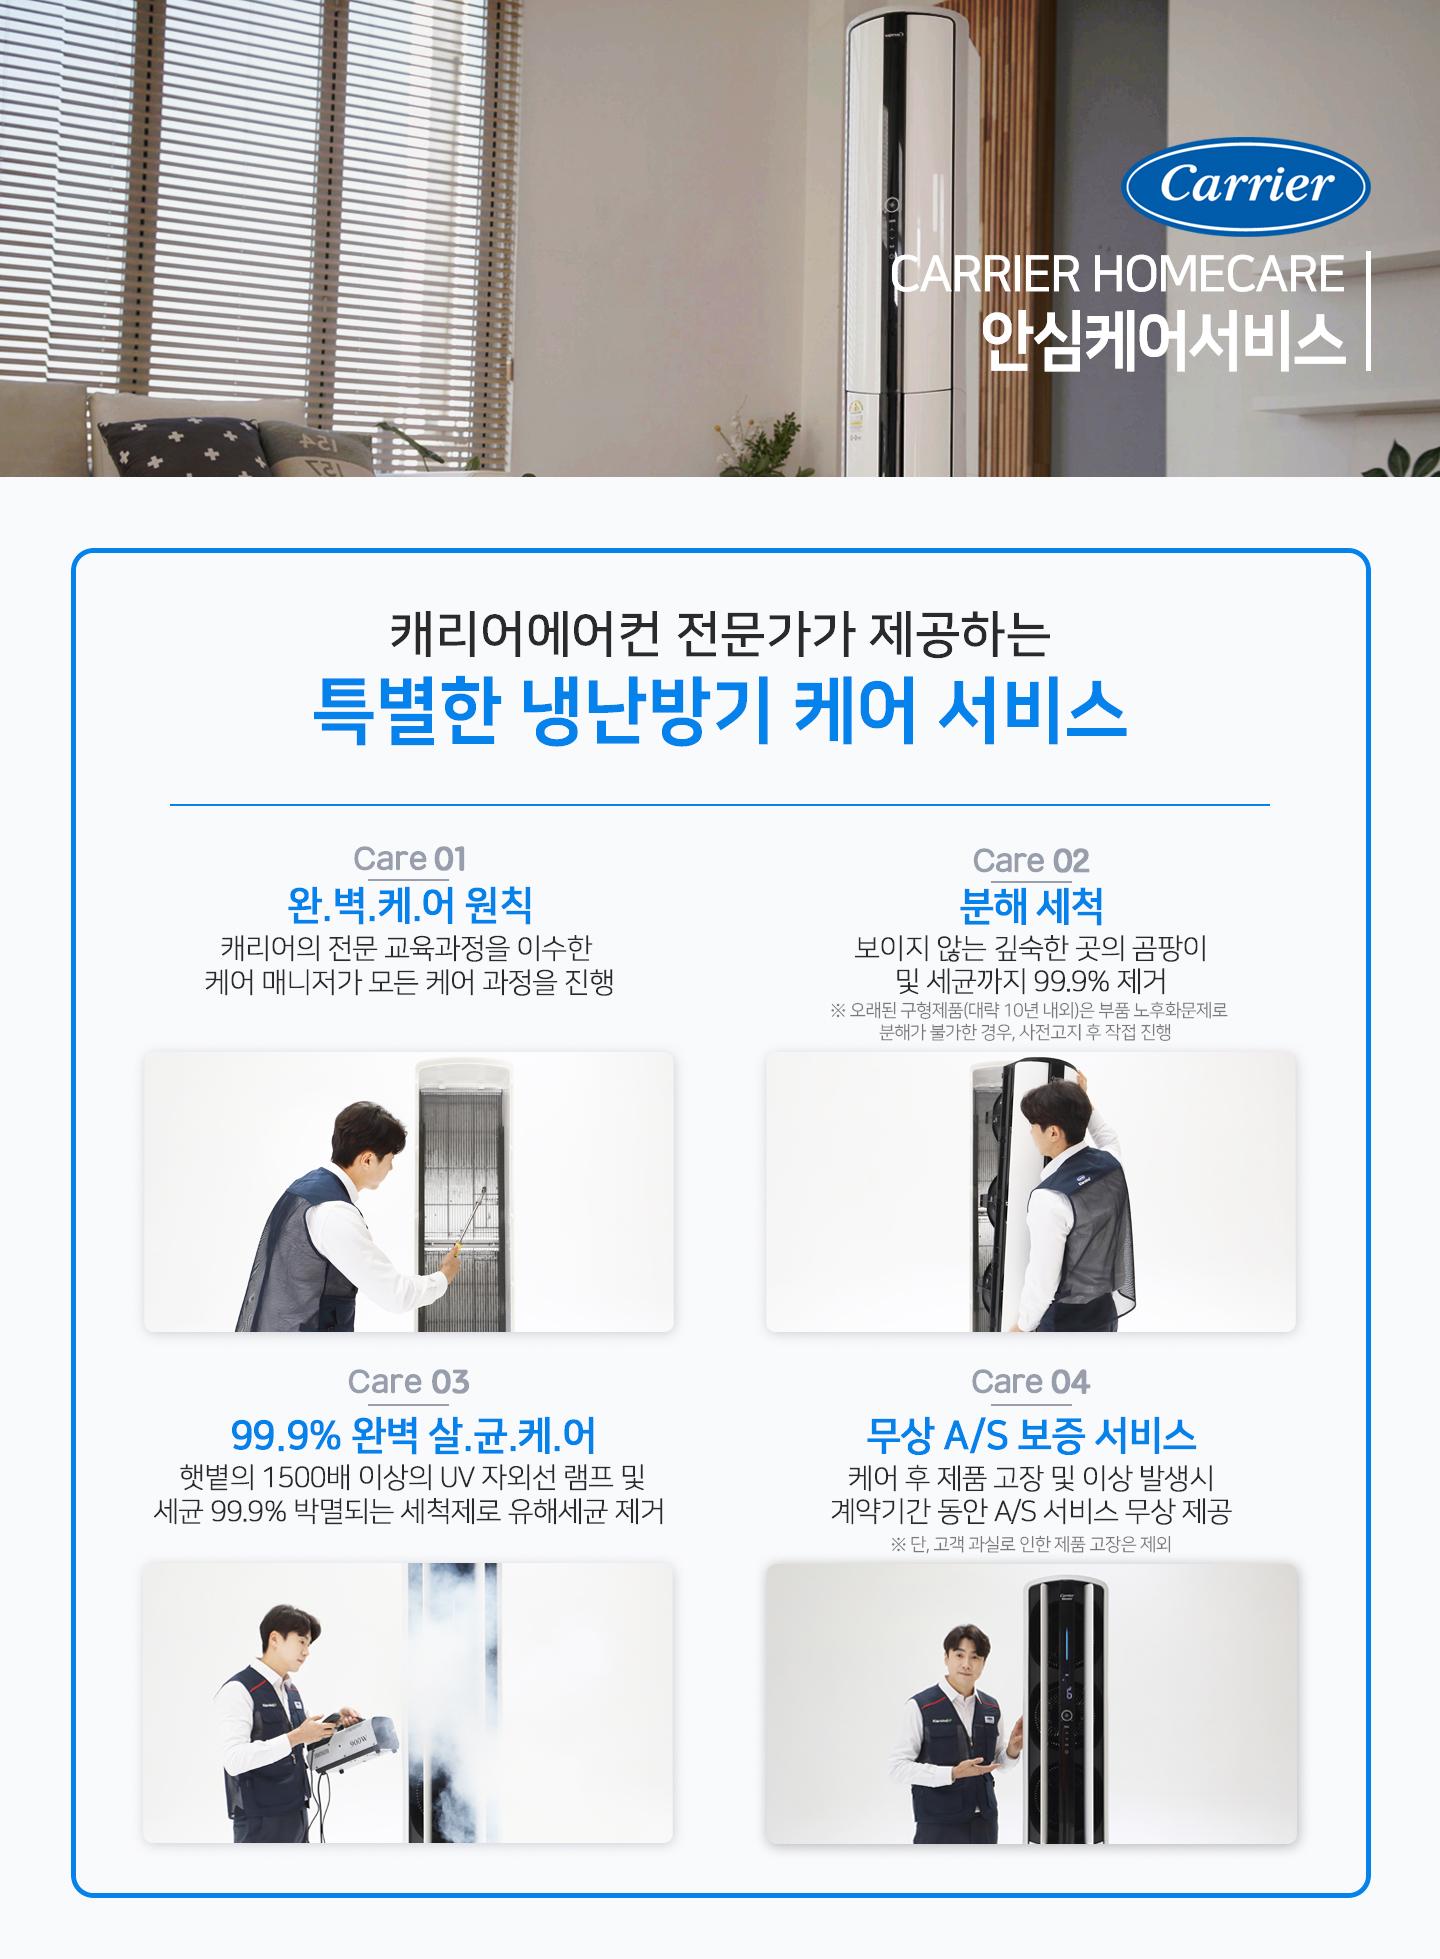 care_service_airconditioner.jpg